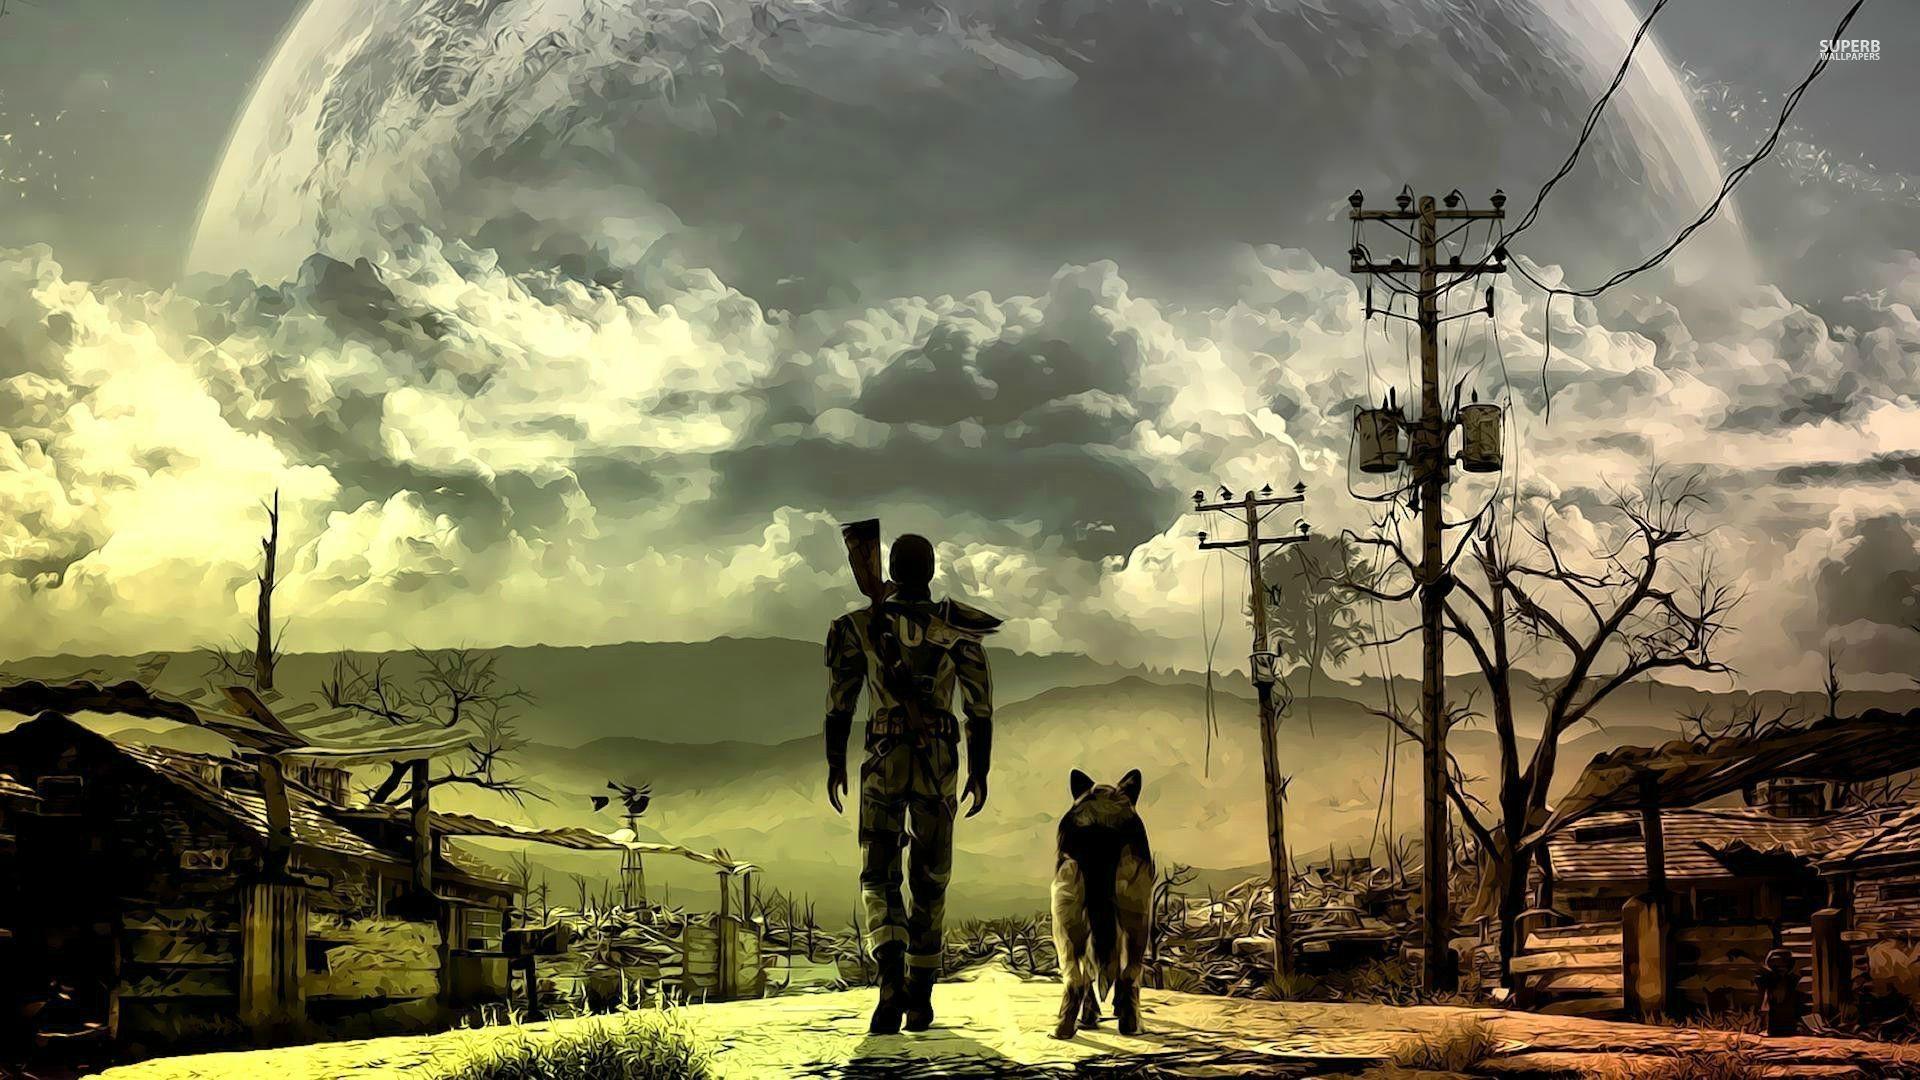 1920x1080 Fallout Wallpapers Wallpaper